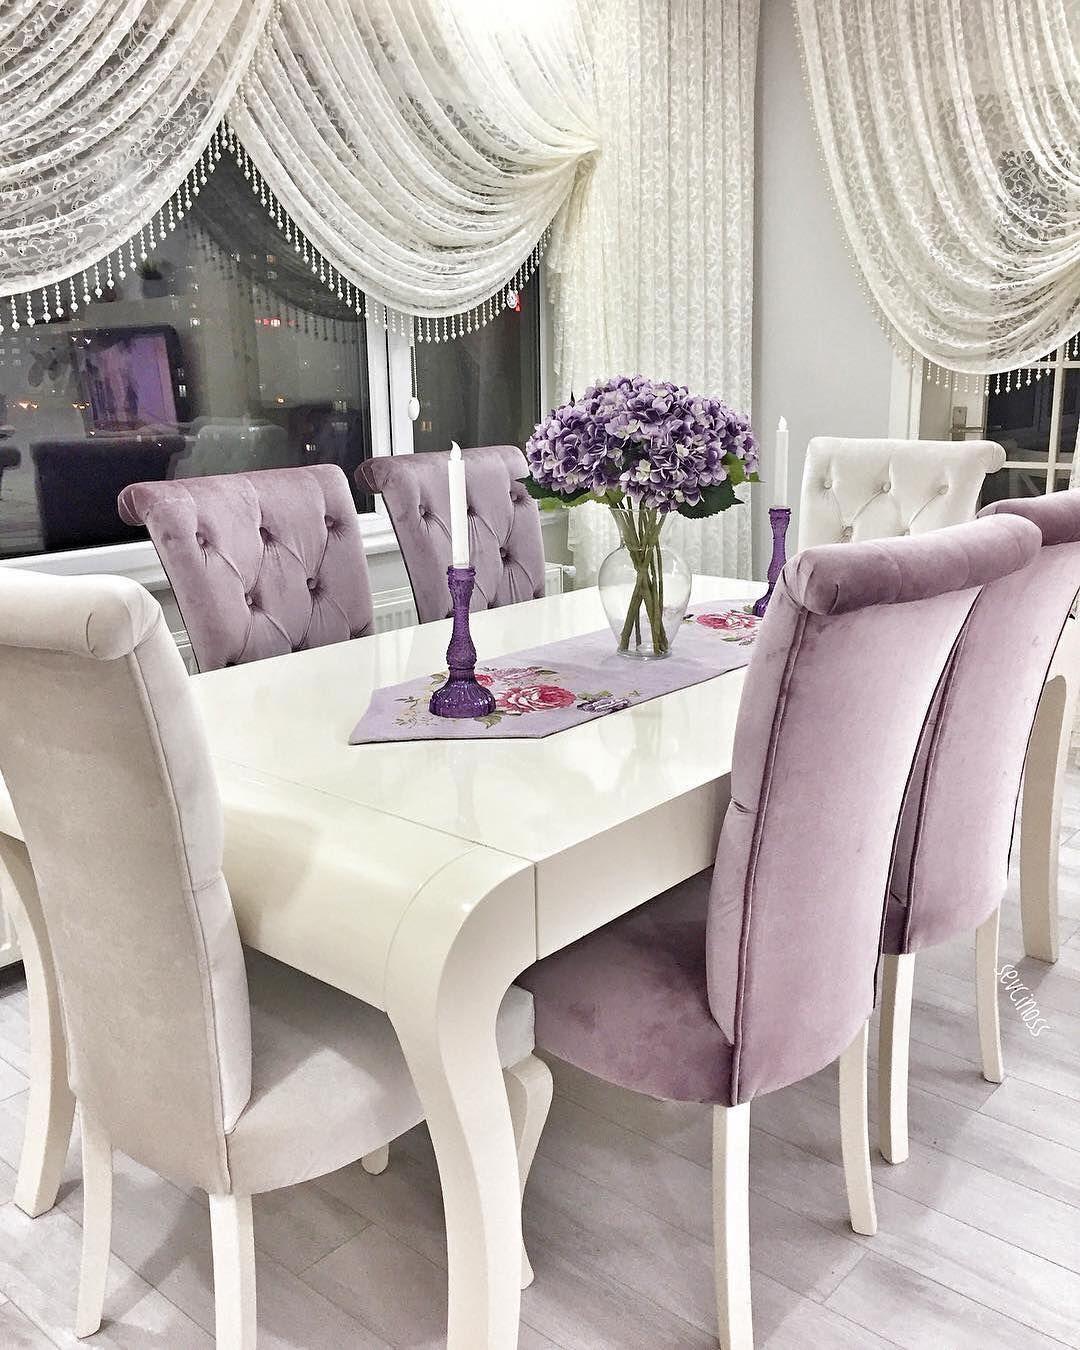 4 535 Likes 45 Comments مجالس مطابخ Decor Decor M M On Instagram تنسيق مميز Sev Luxury Dining Room Beautiful Dining Rooms Elegant Dining Room